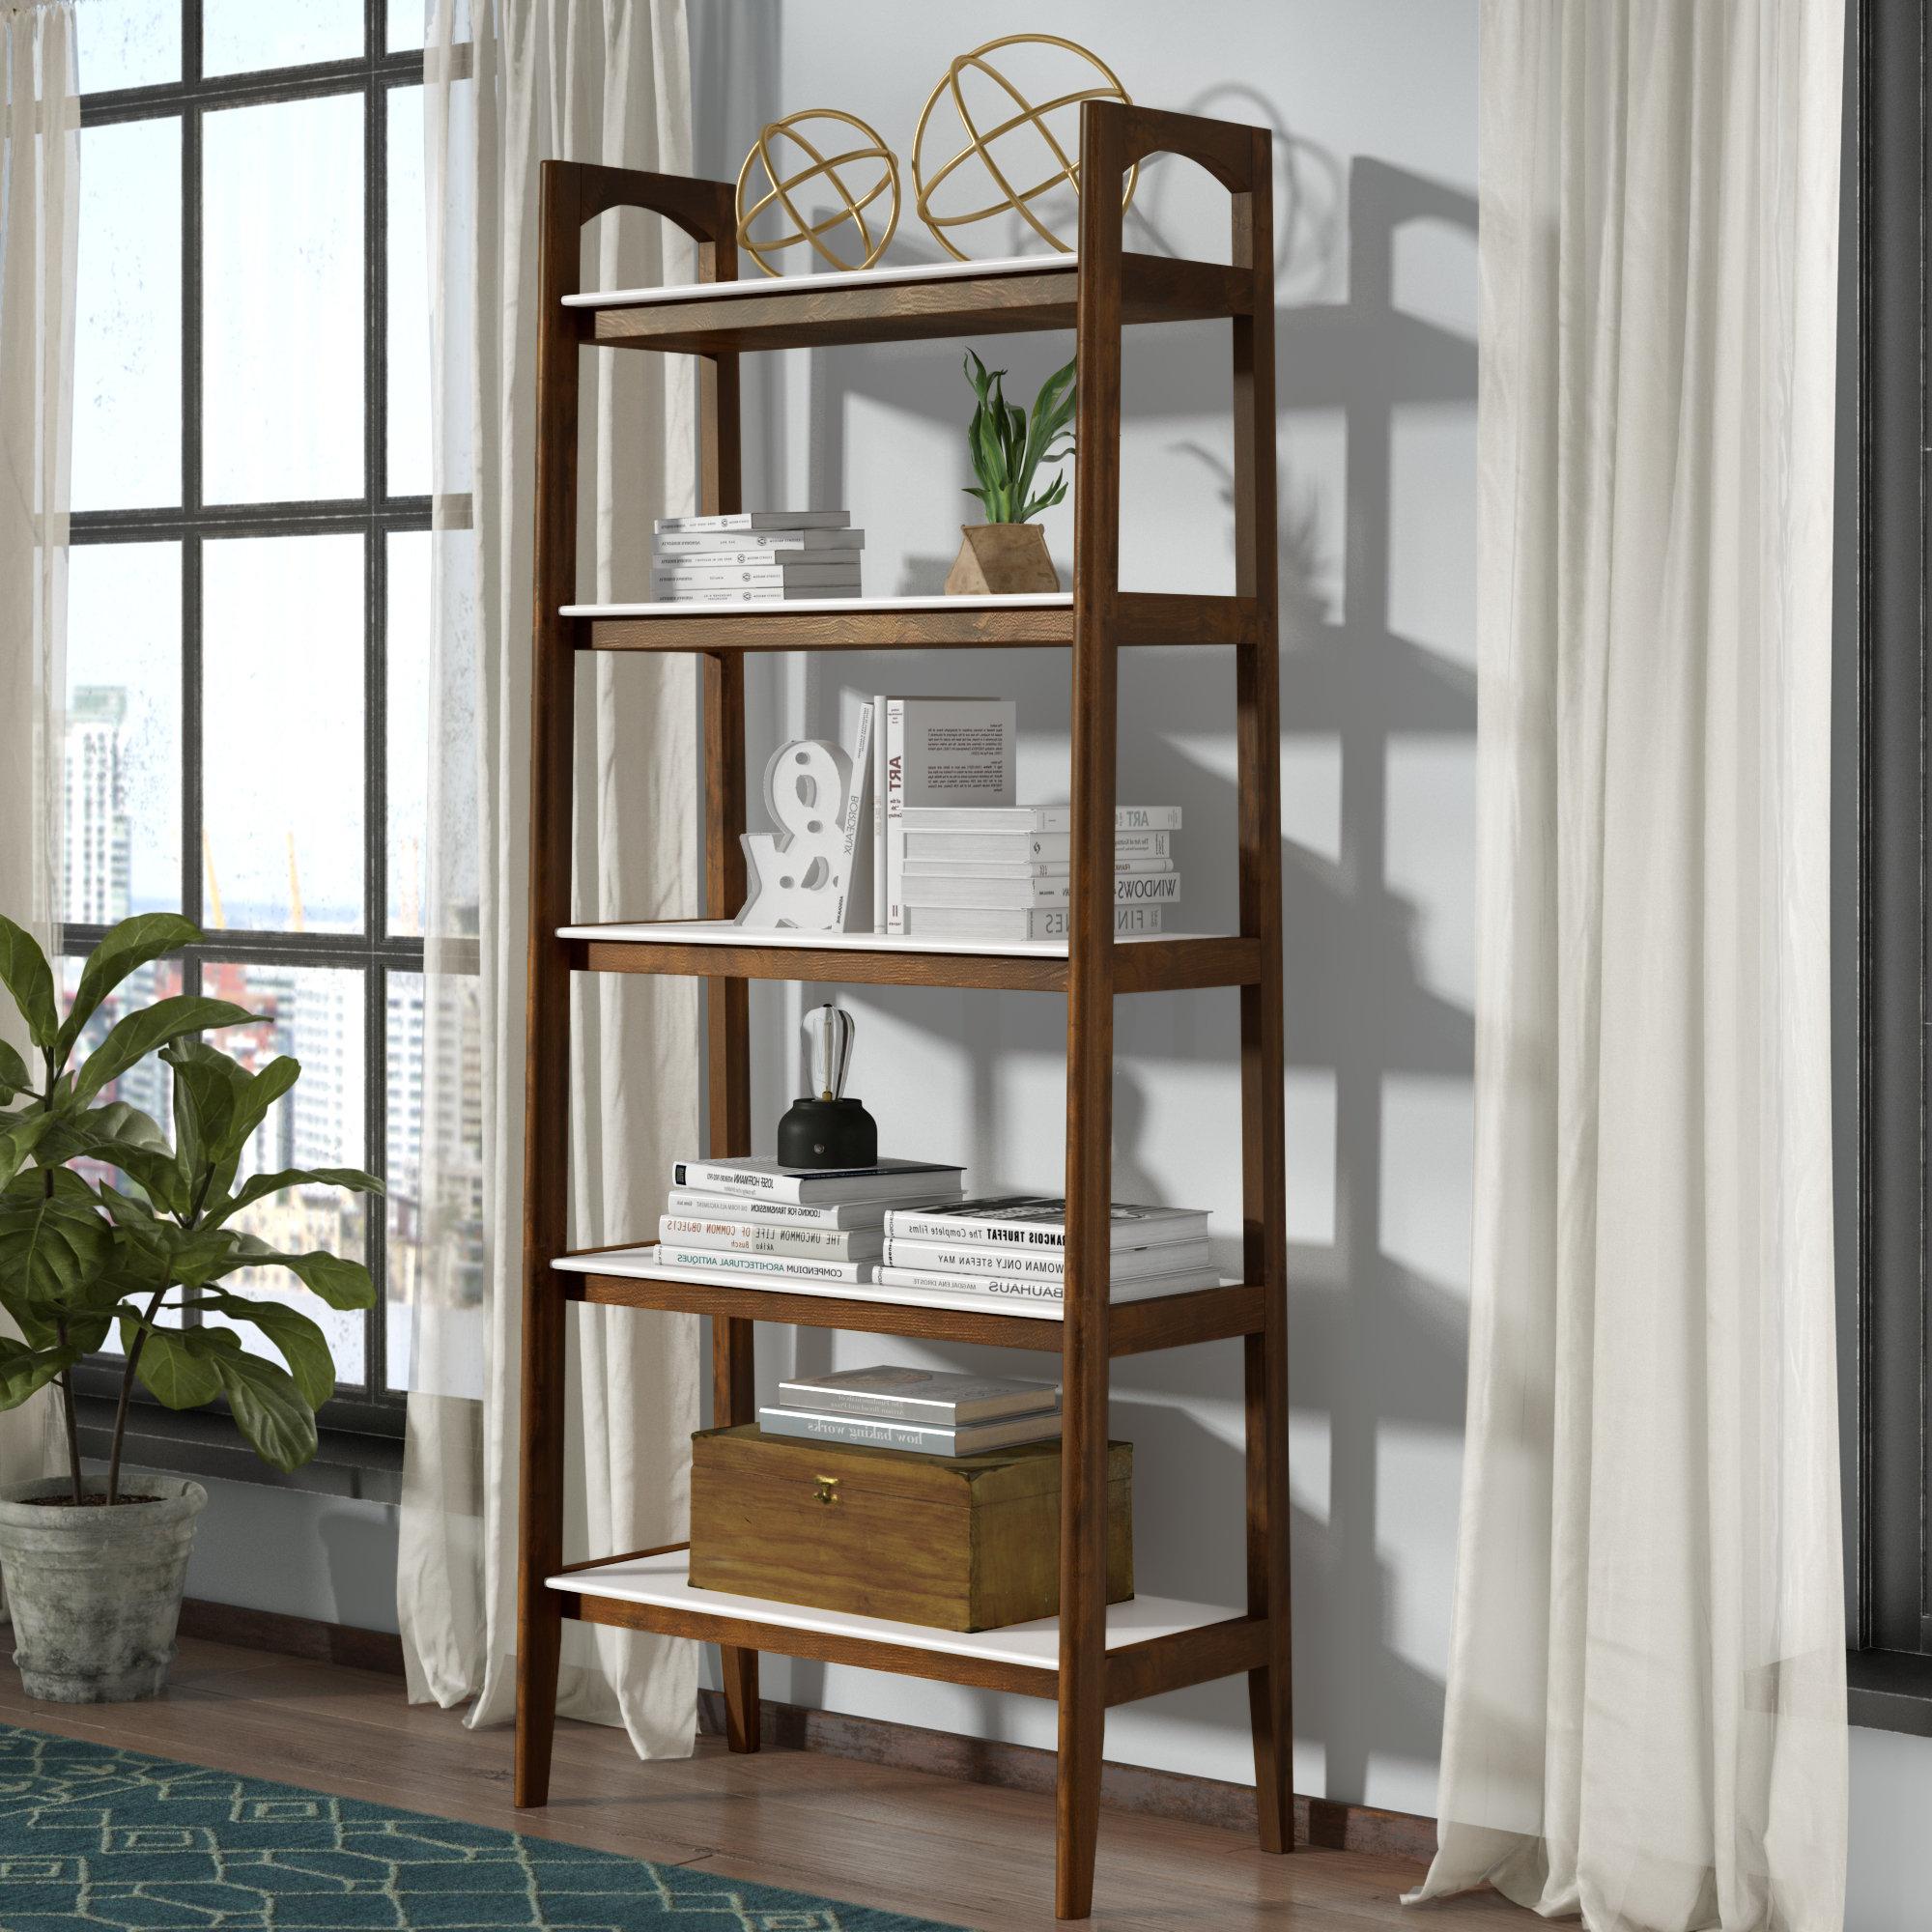 Reclaimed Wood Ladder Shelf (View 15 of 20)